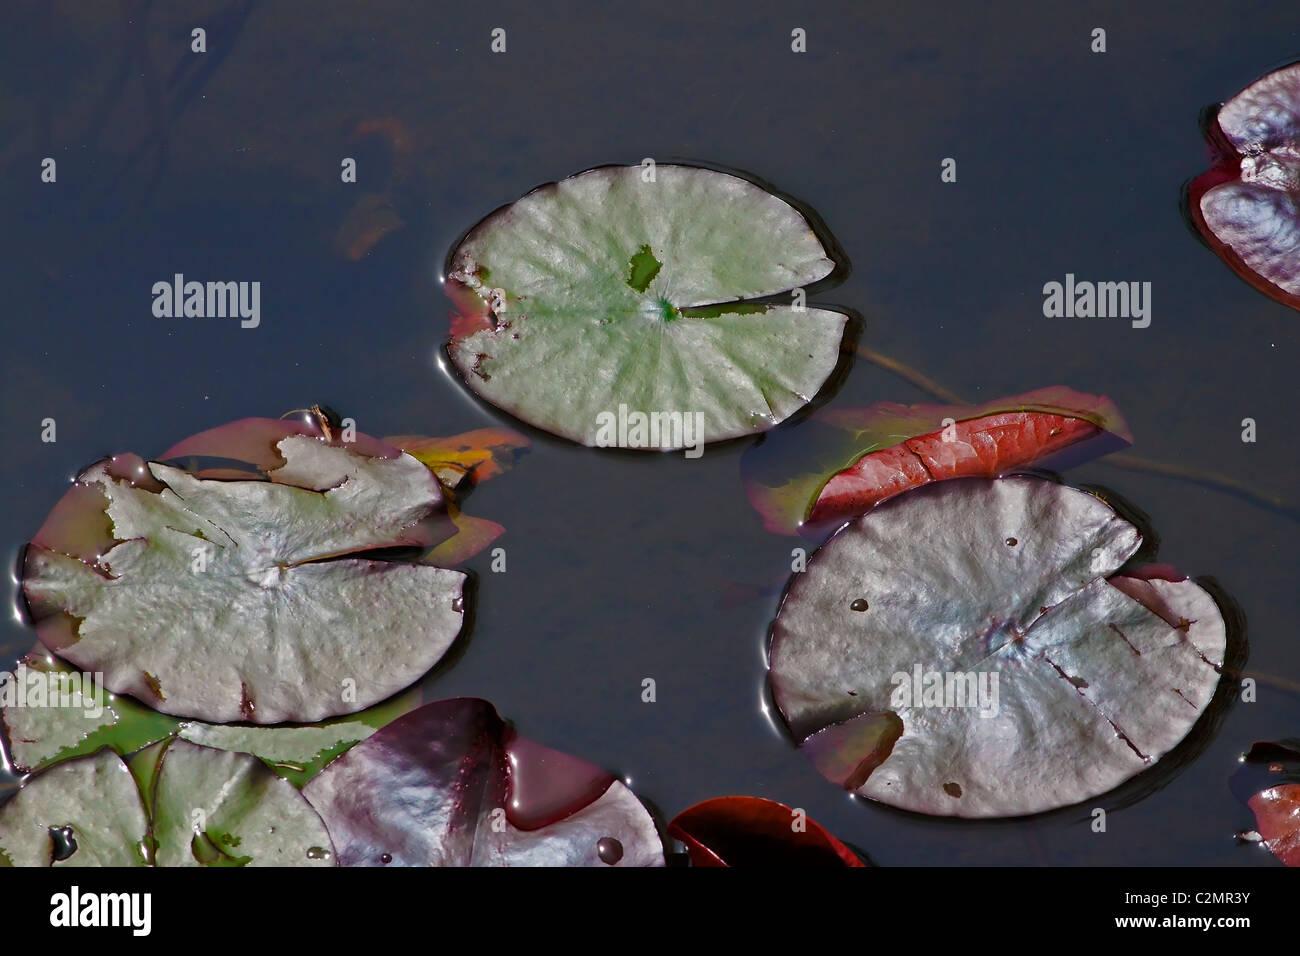 lilly de agua Imagen De Stock